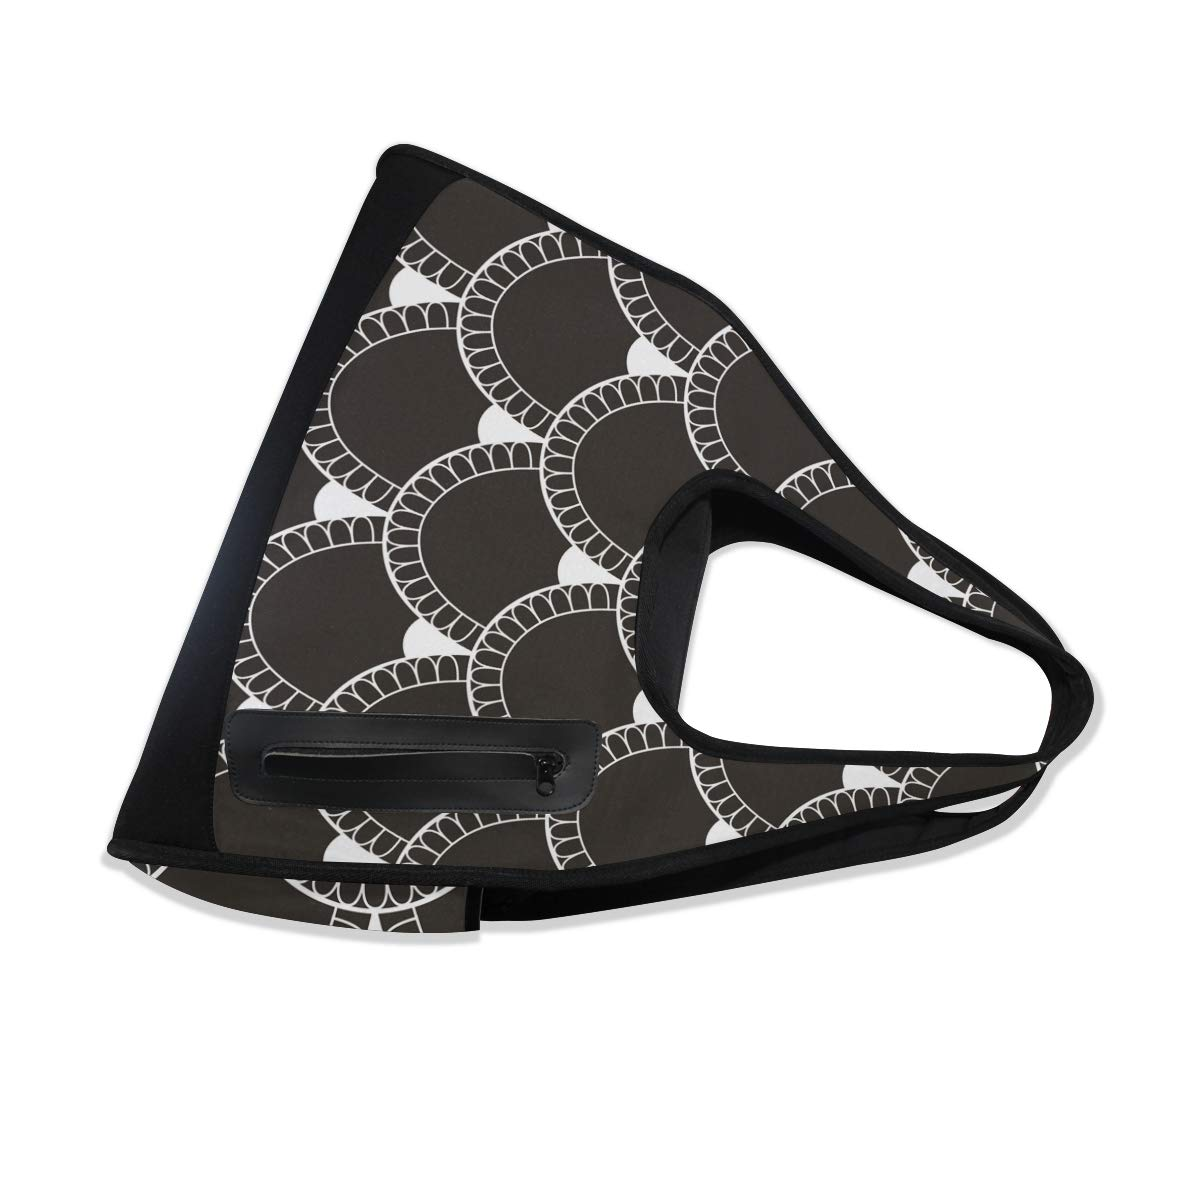 Unisex Travel Duffels Gym Bag Black And White Mermaid Scale Canvas Weekender Bag Shoulder Bag Totes bags